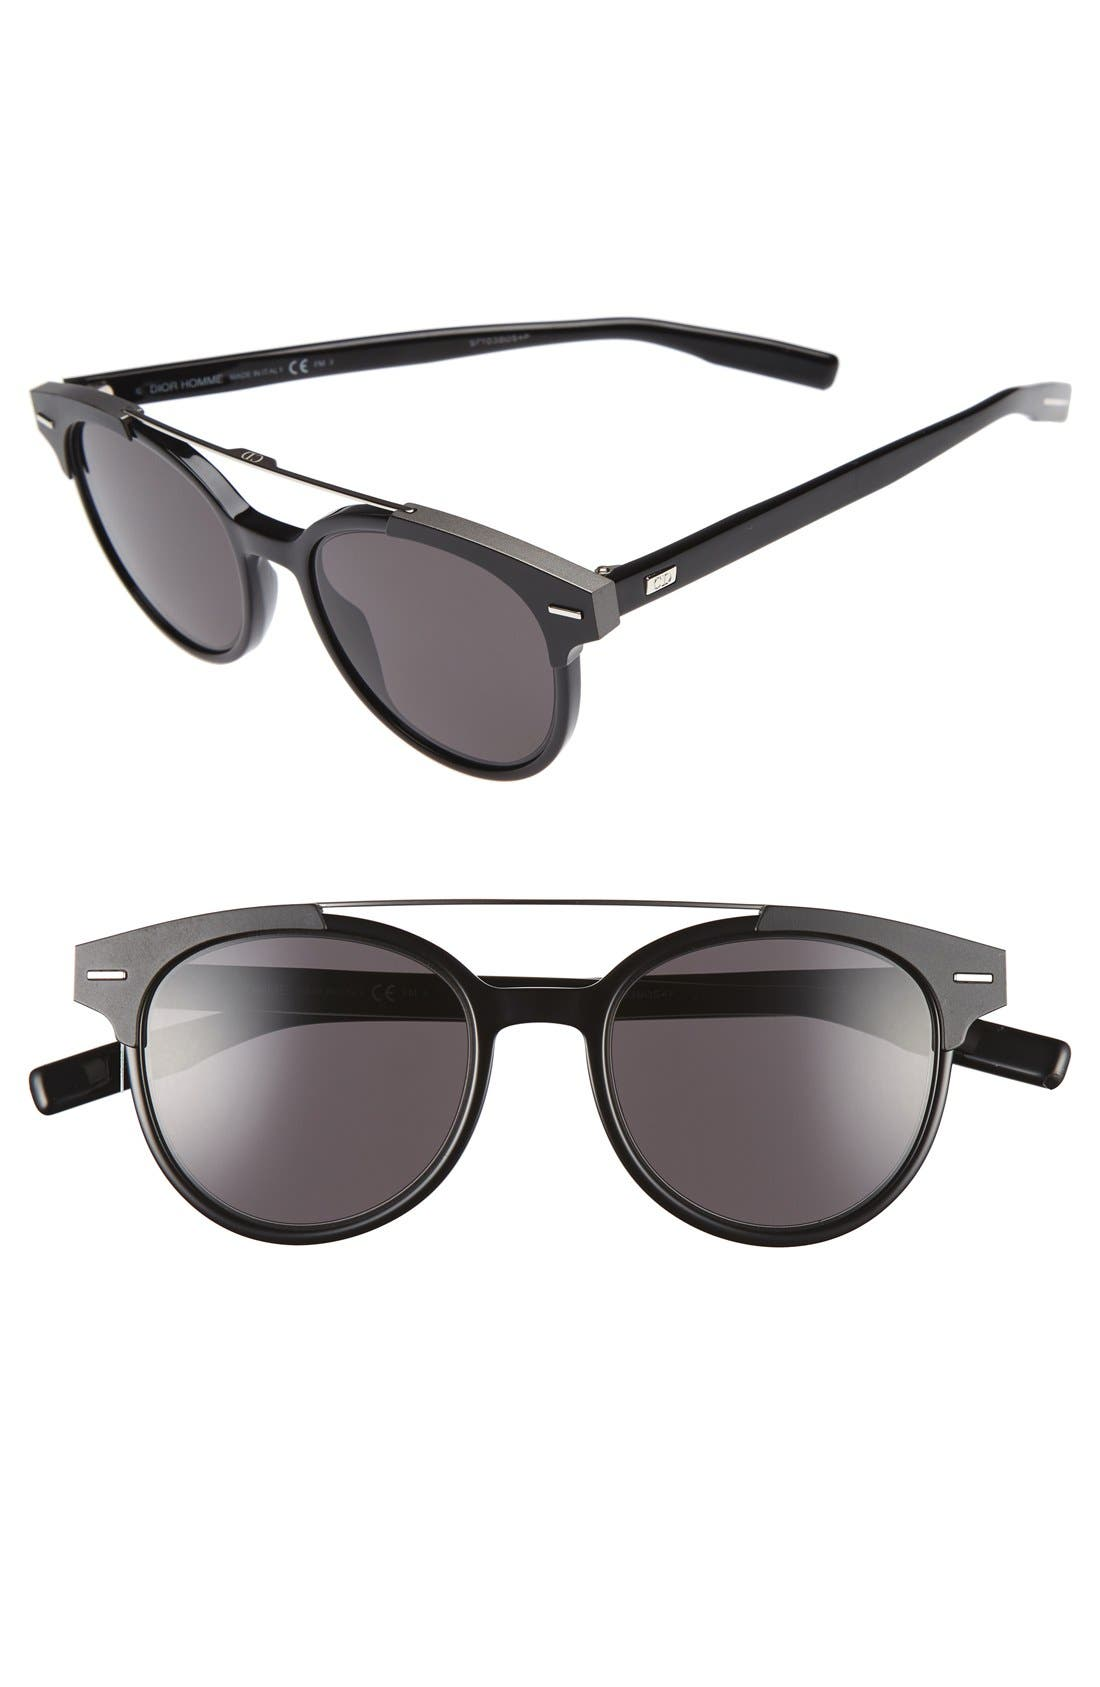 Dior 'Black Tie' 51mm Sunglasses,                         Main,                         color, Black